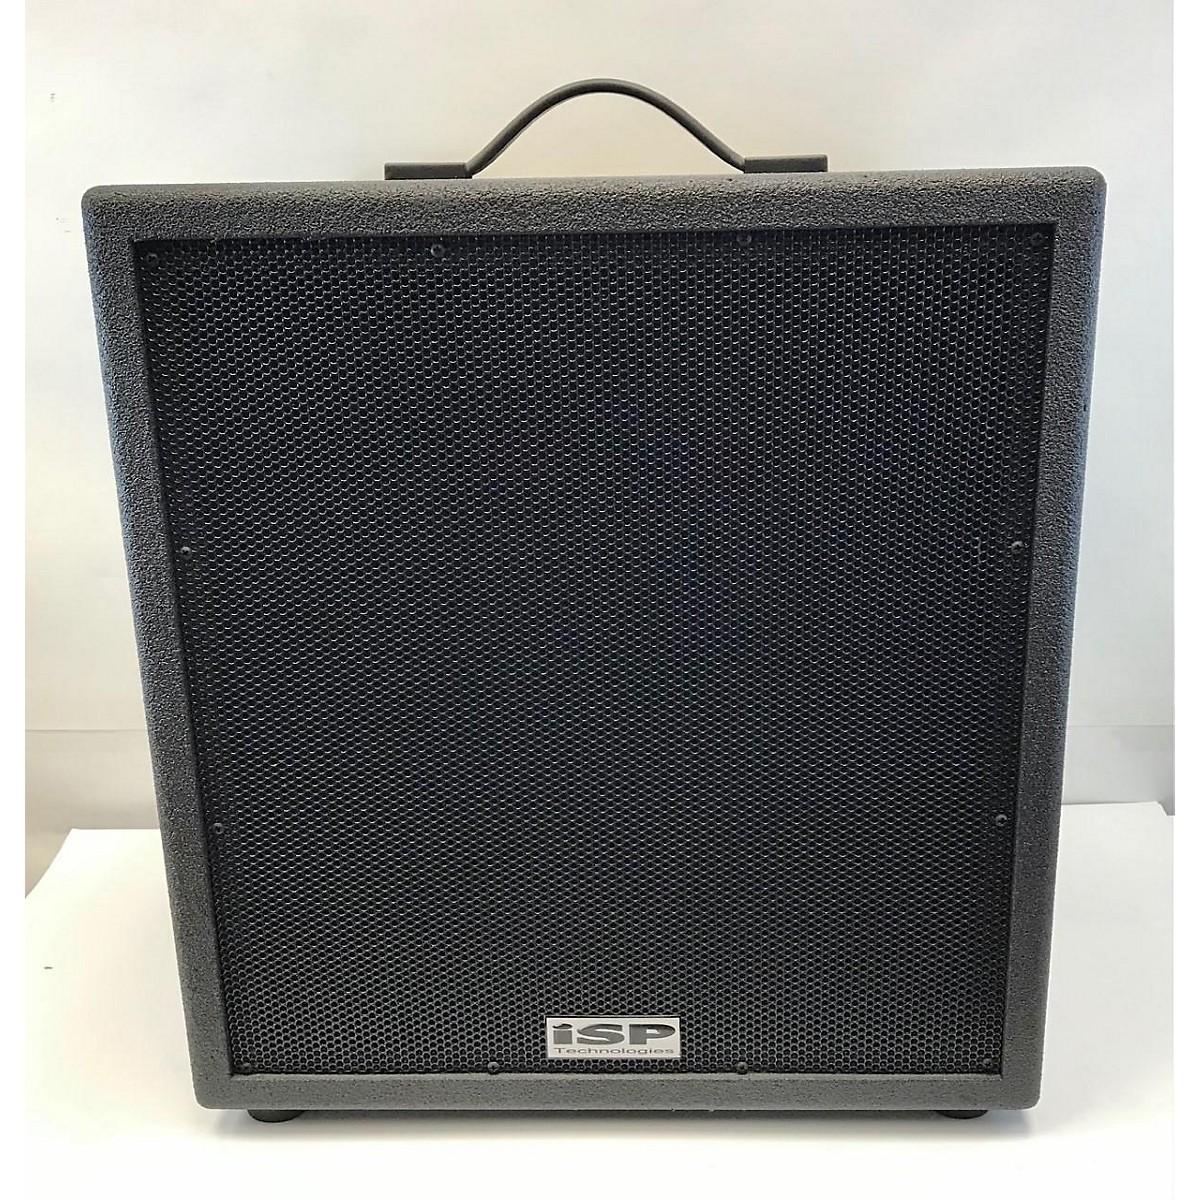 Isp Technologies Vector Sub Series 210 Guitar Cabinet